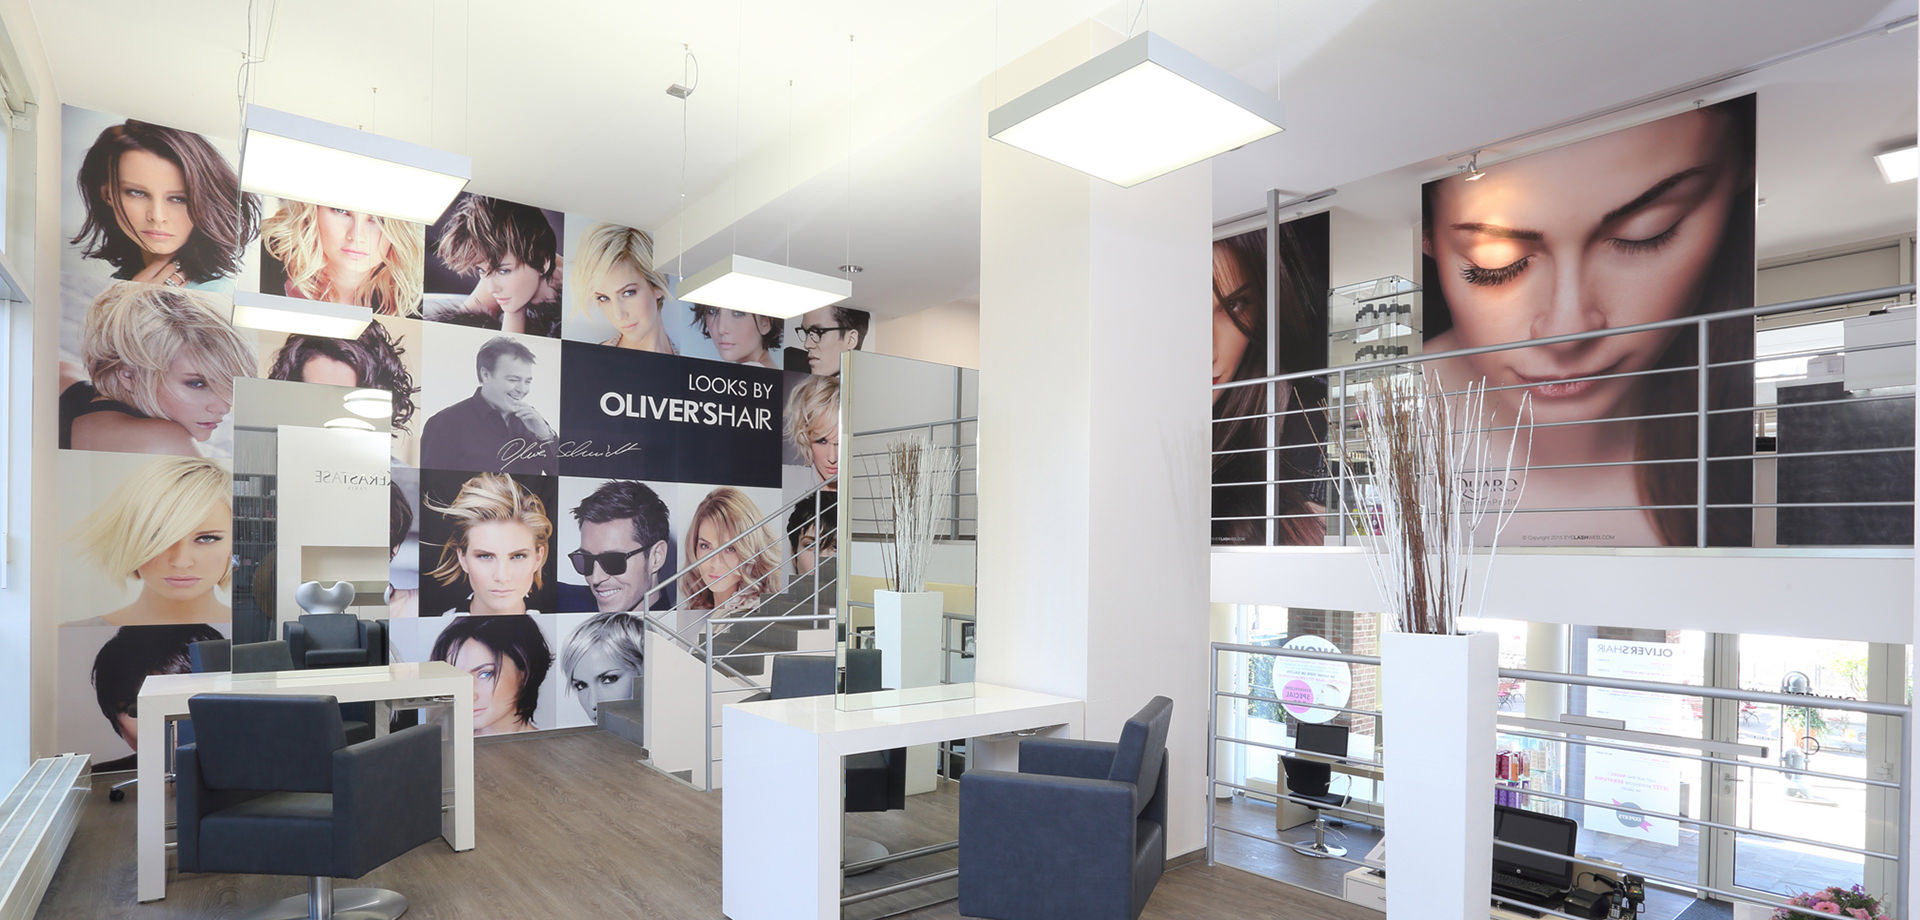 rheinort 2 a altstadt bester friseur in d sseldorf oliver schmidt hairdesign. Black Bedroom Furniture Sets. Home Design Ideas